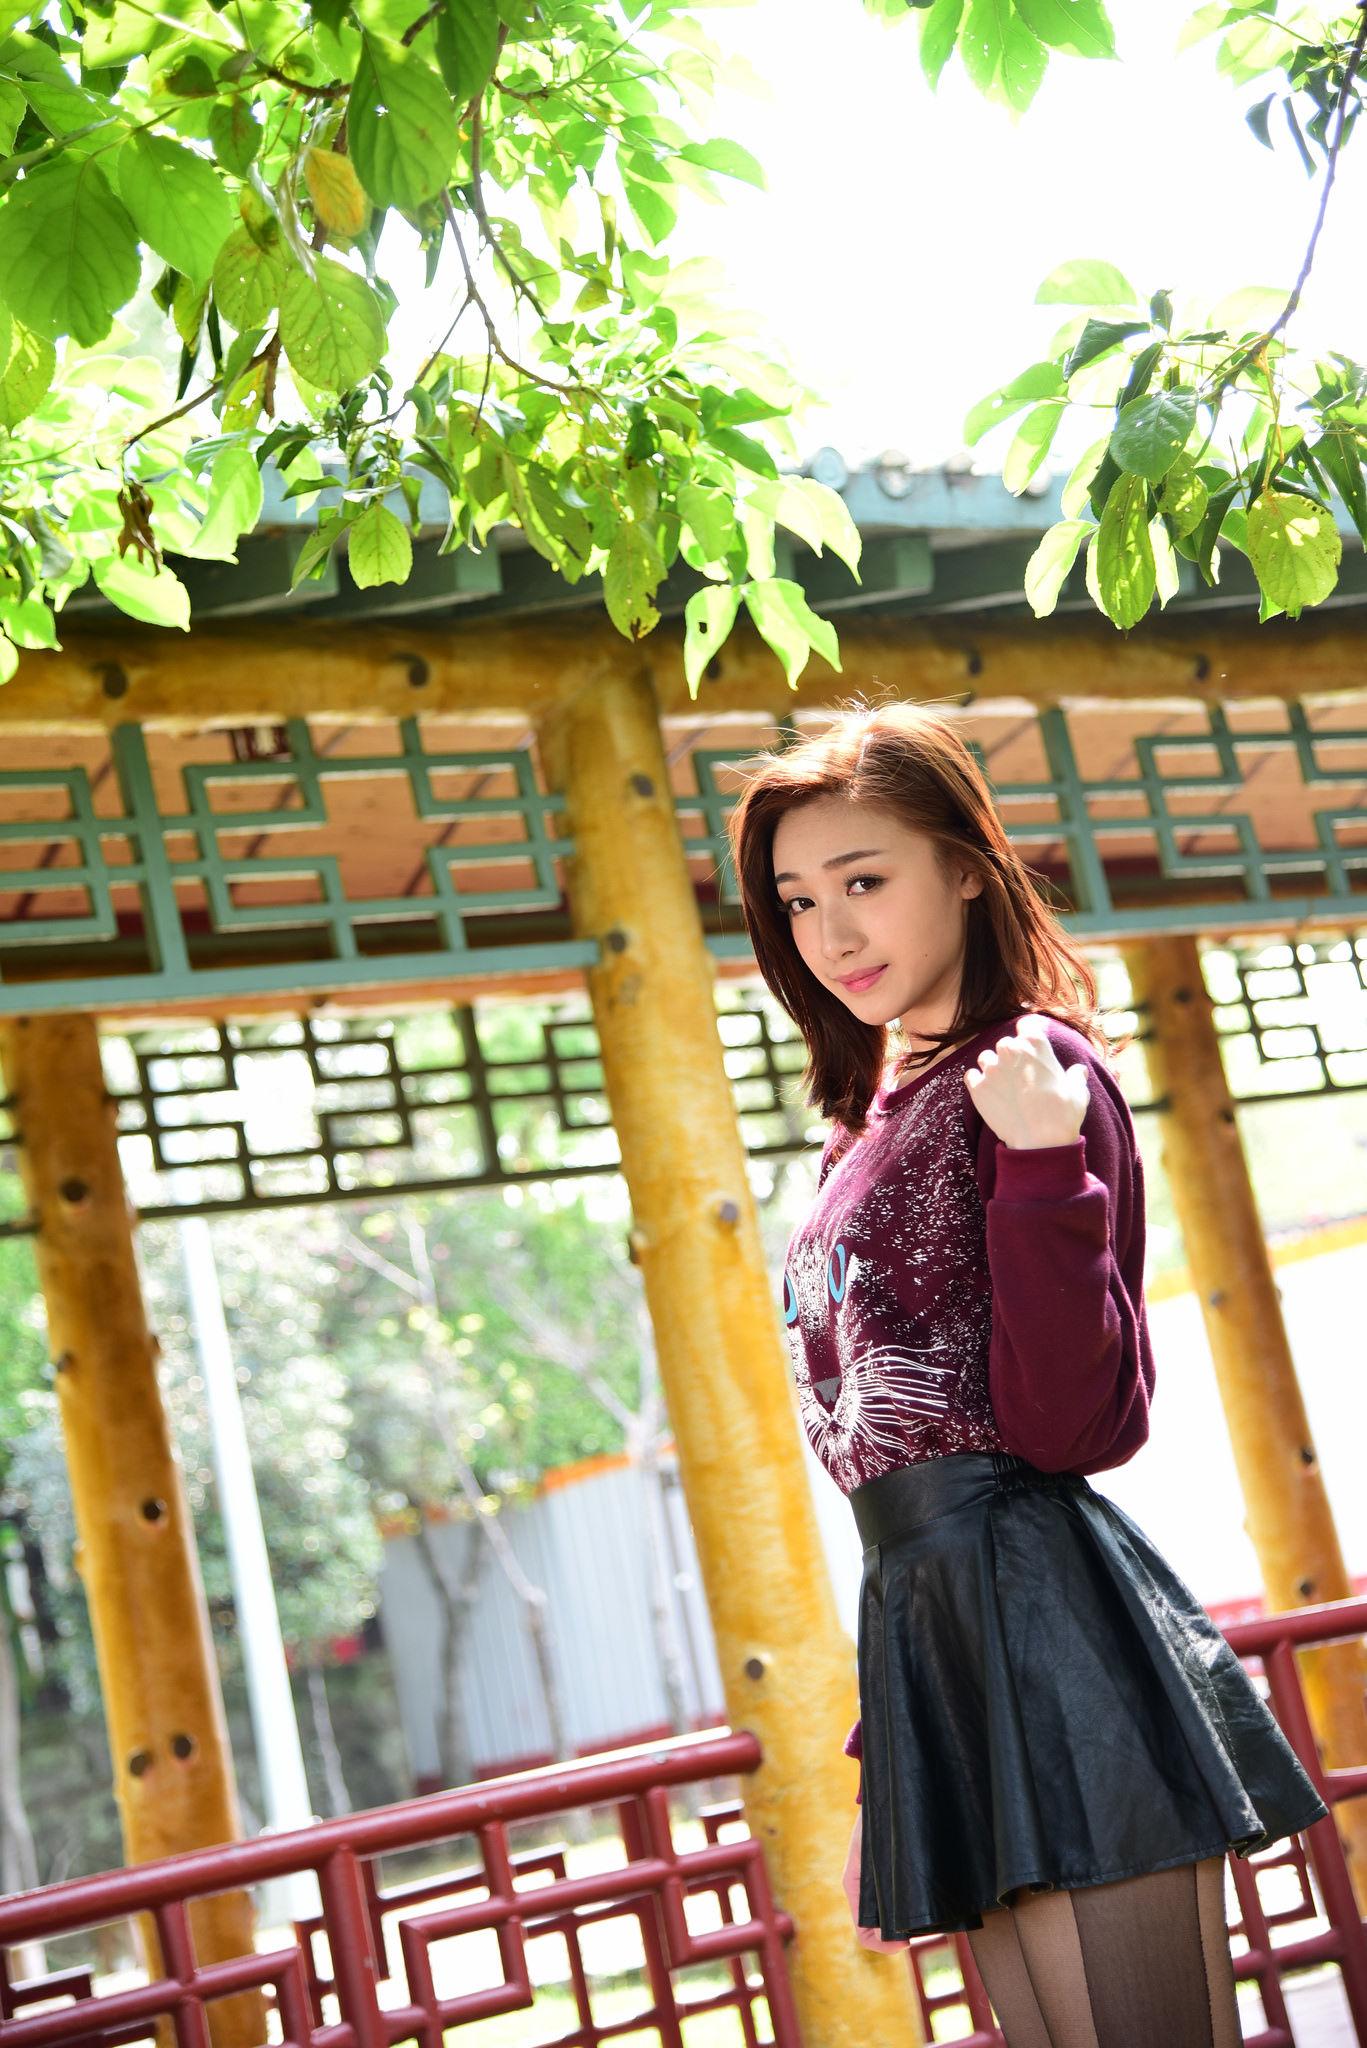 VOL.495 [台湾正妹]清新外拍养眼:段璟乐(段乐乐)超高清个人性感漂亮大图(36P)